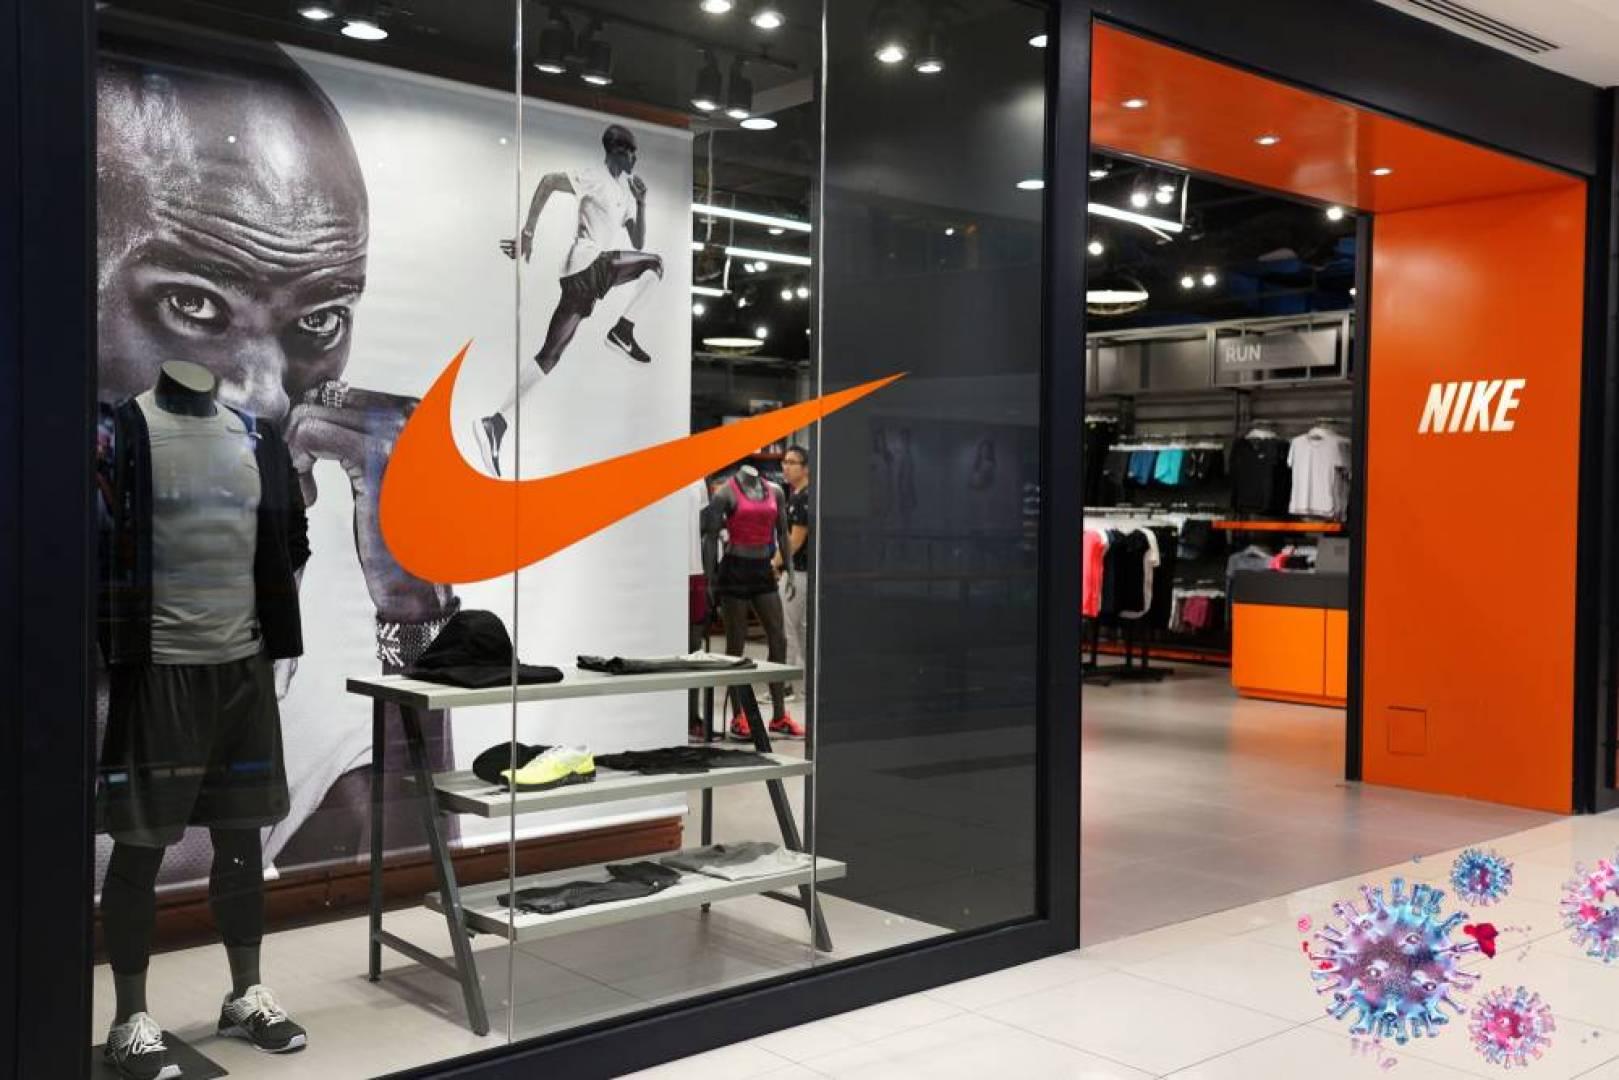 «Nike» تحقق طفرة في مبيعات الإنترنت.. رغم تفشي «كورونا»